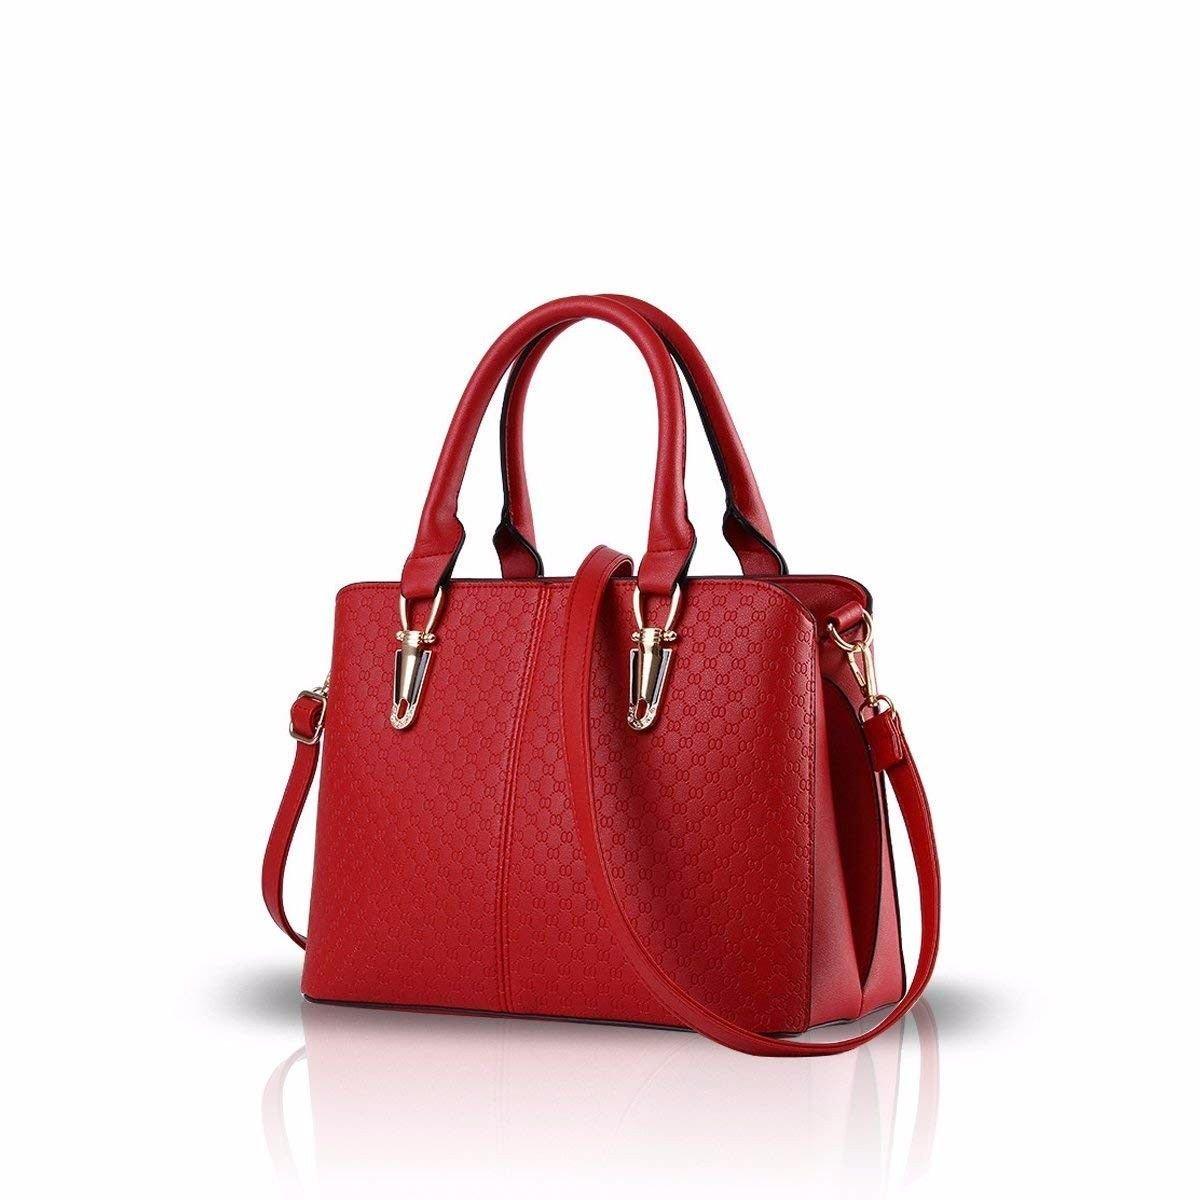 Gxinyanlong Fashion trend handbag, retro leisure single shoulder bag, lady Satchel,gules